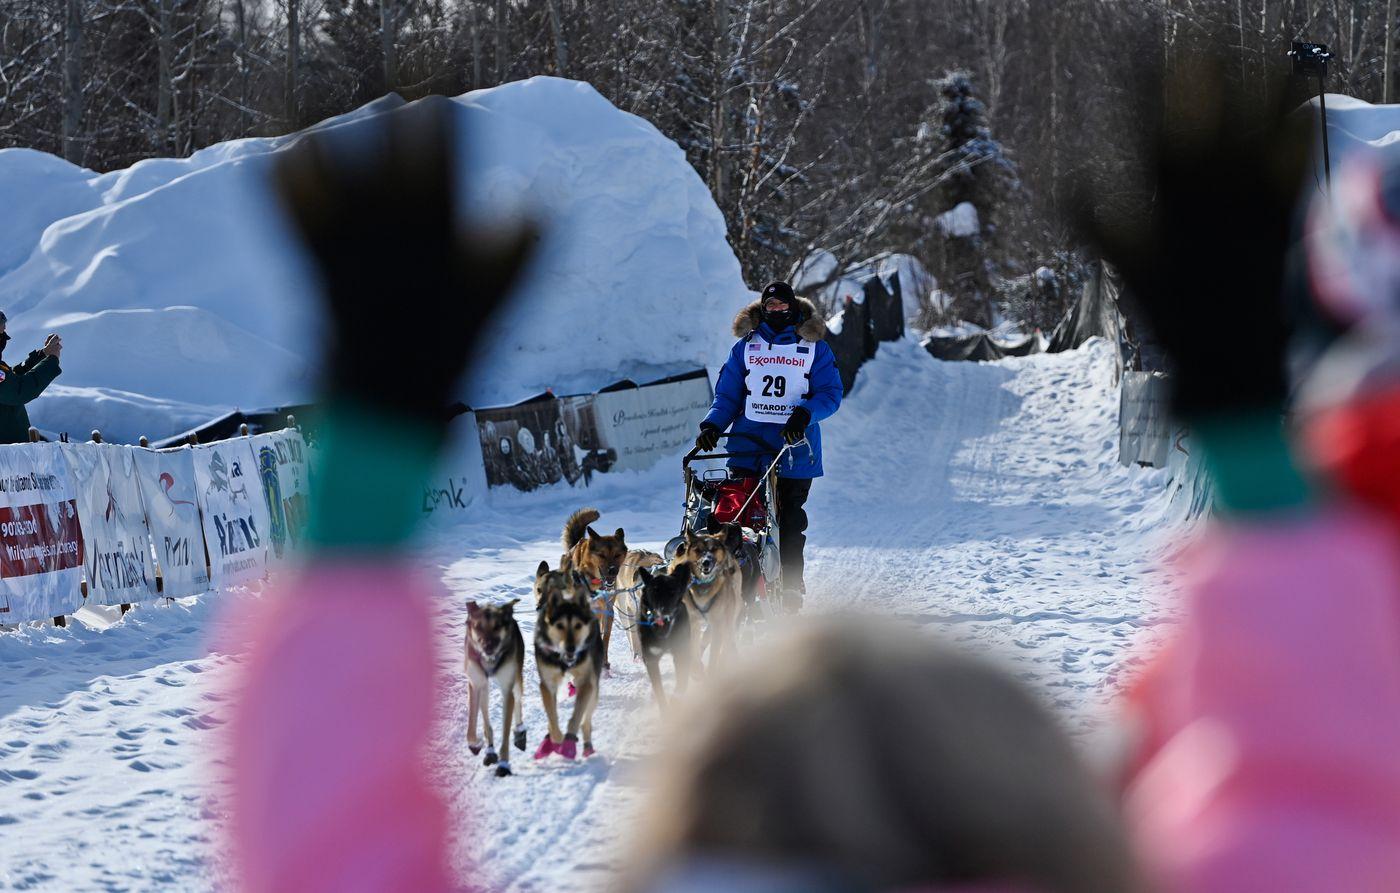 Matthew Failor arrives at the Iditarod finish line in Willow to cheers from Iditarod veteran DeeDee Jonrowe on March 16, 2021. (Marc Lester / ADN)